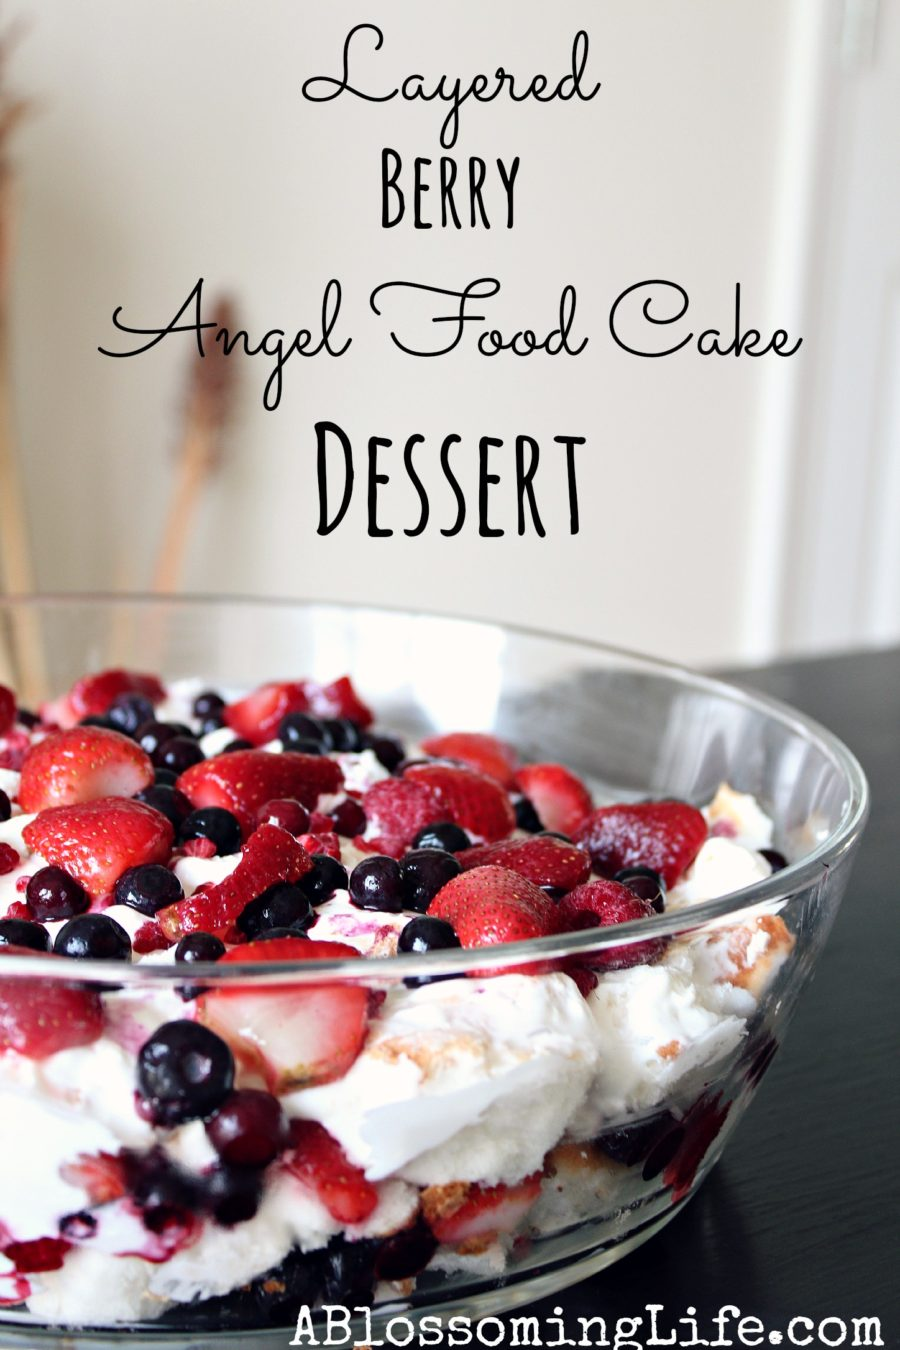 Layered angel food cake dessert